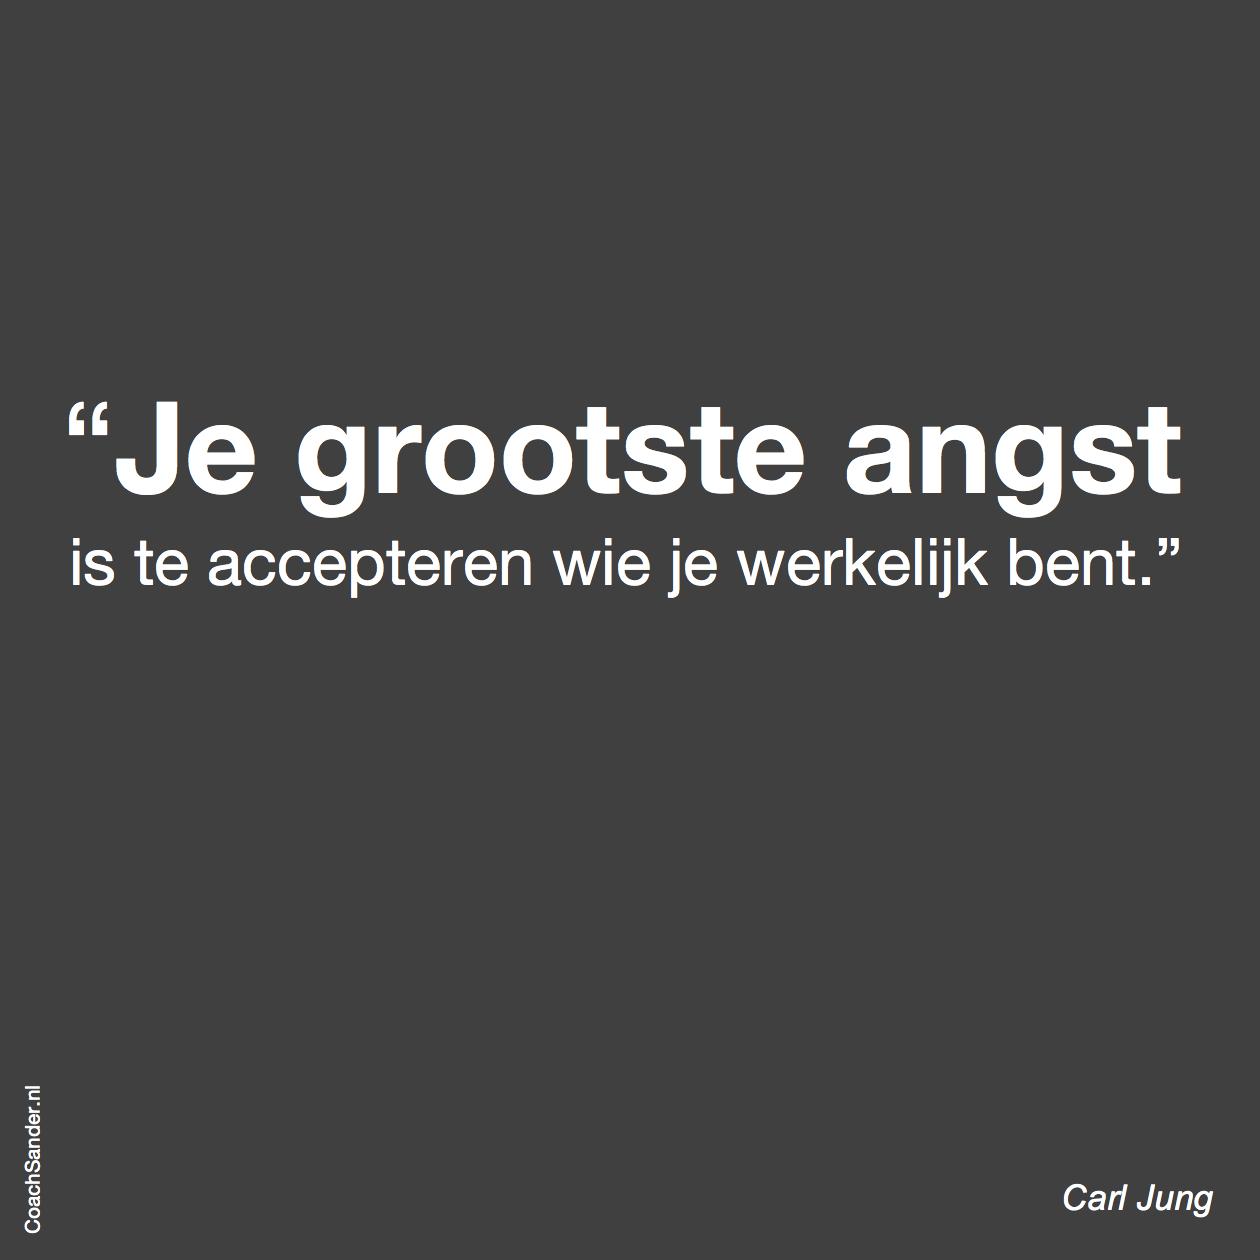 Je grootste angst... - CoachSander.nl